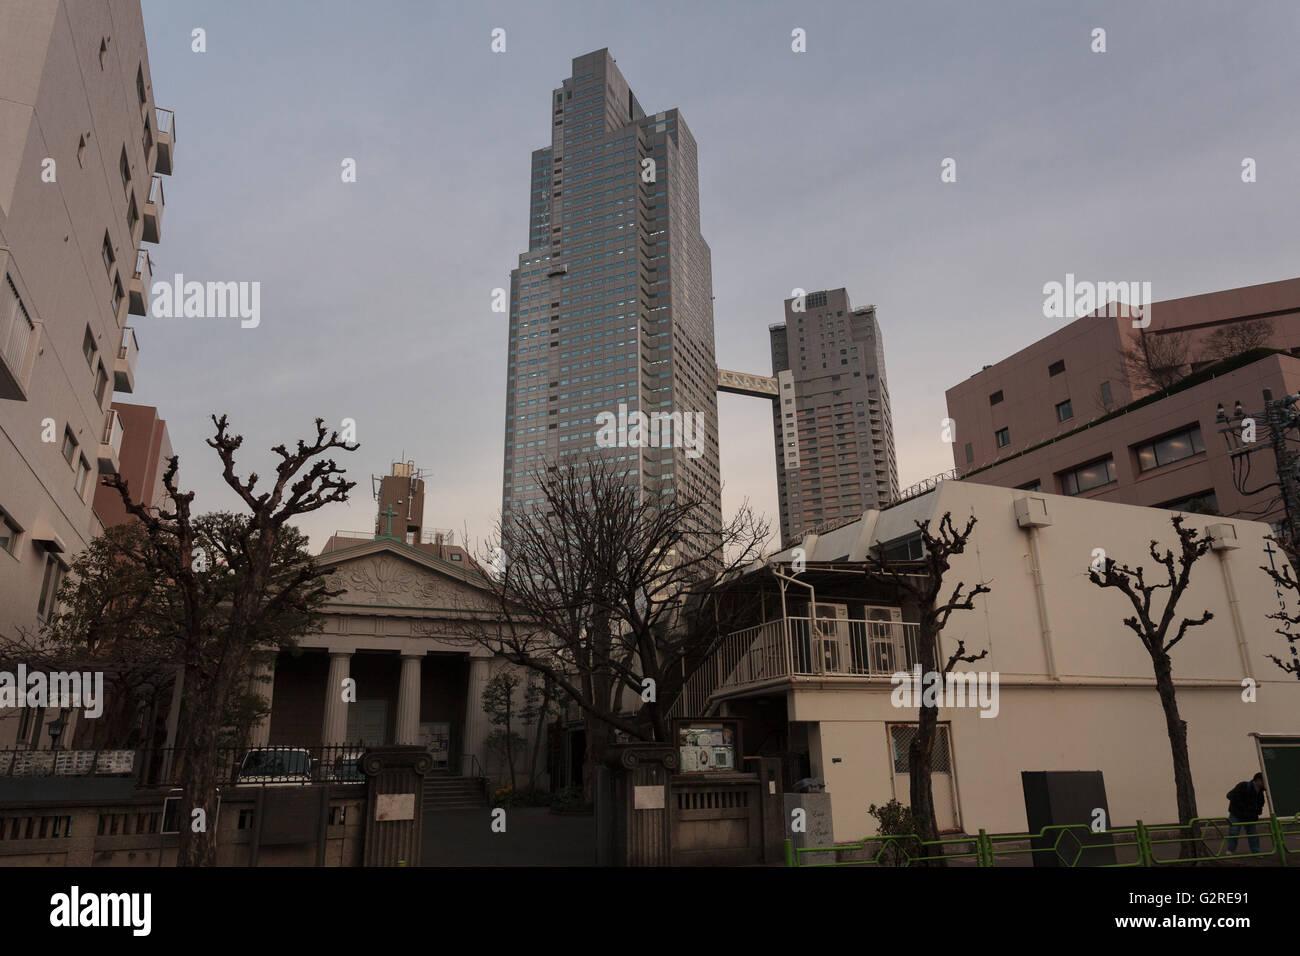 Lukas Turm in Chuo Ward, Tokio, Japan. Freitag, 5. Februar 2016 Stockbild